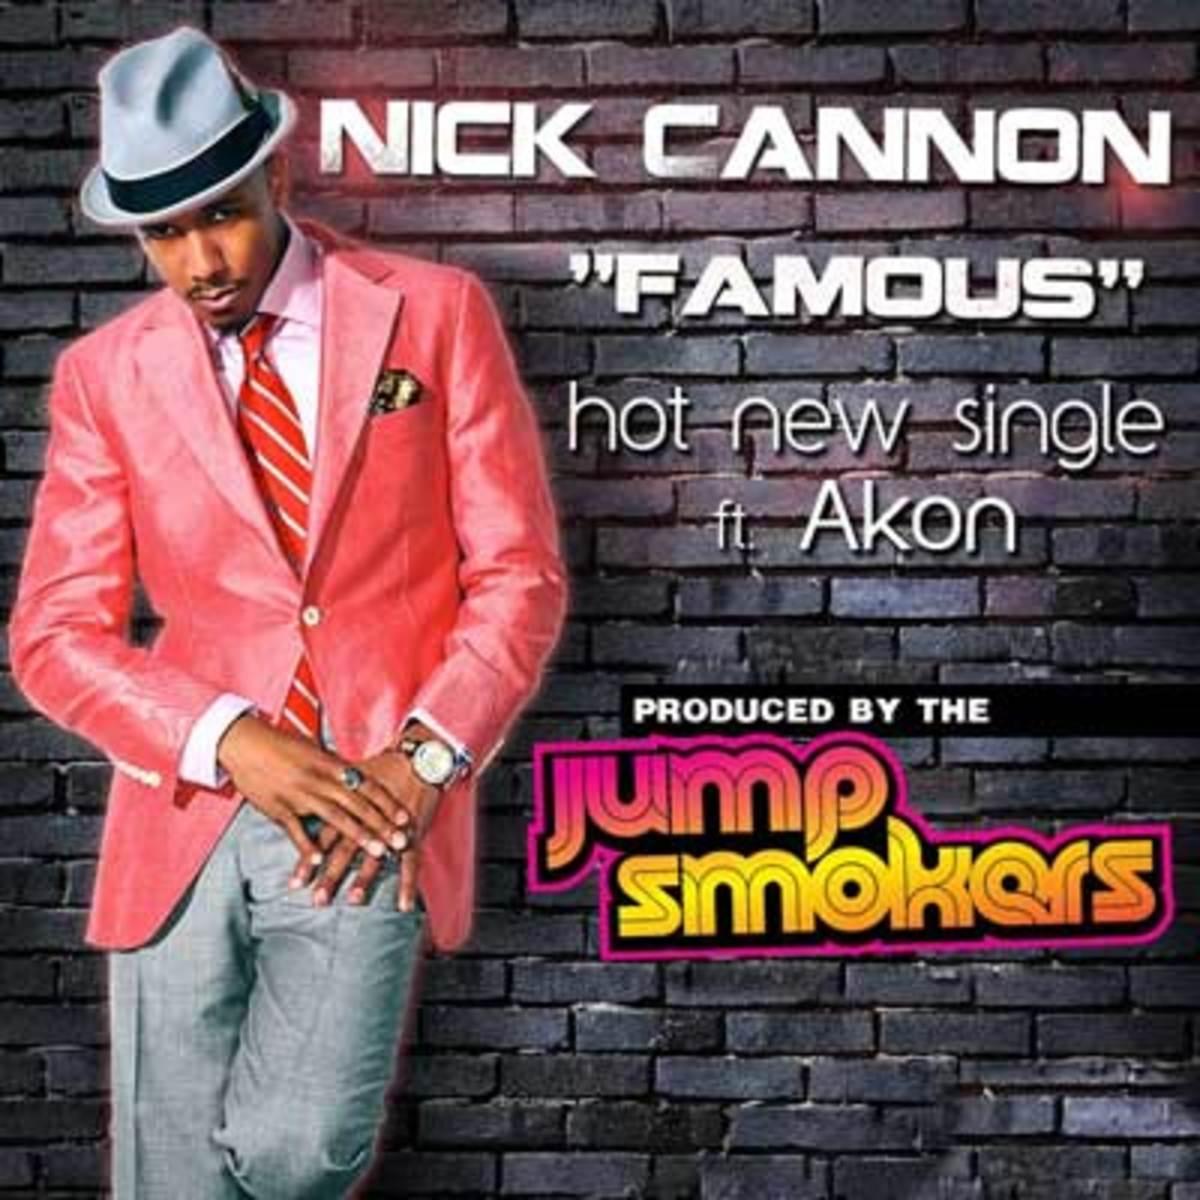 nickcannon-famous.jpg